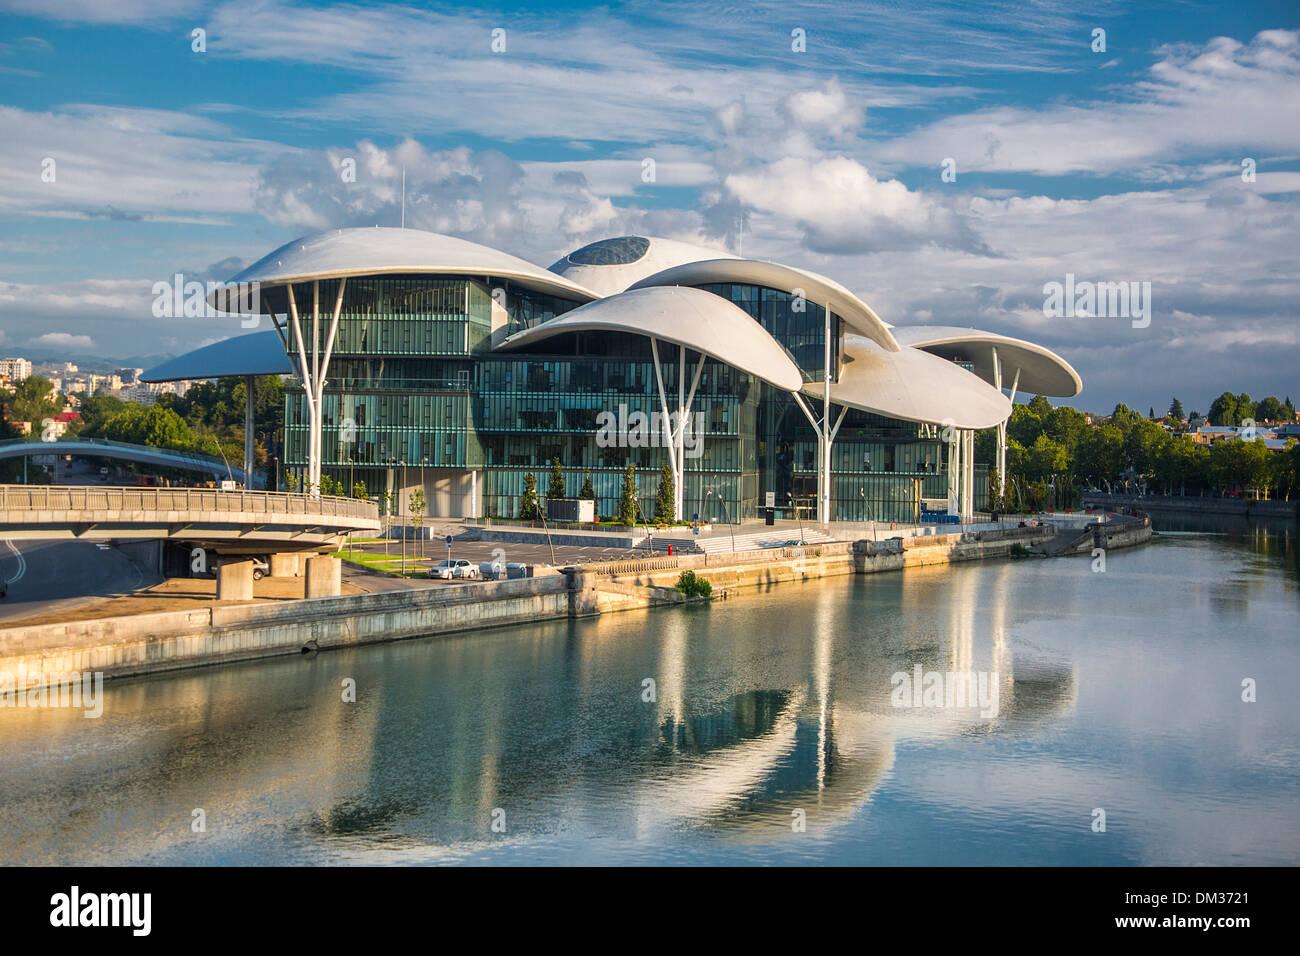 Justice, Tbilisi, architecture, bridge, city, downtown, Georgia, Caucasus, Eurasia, new, palace, river, touristic, travel, - Stock Image